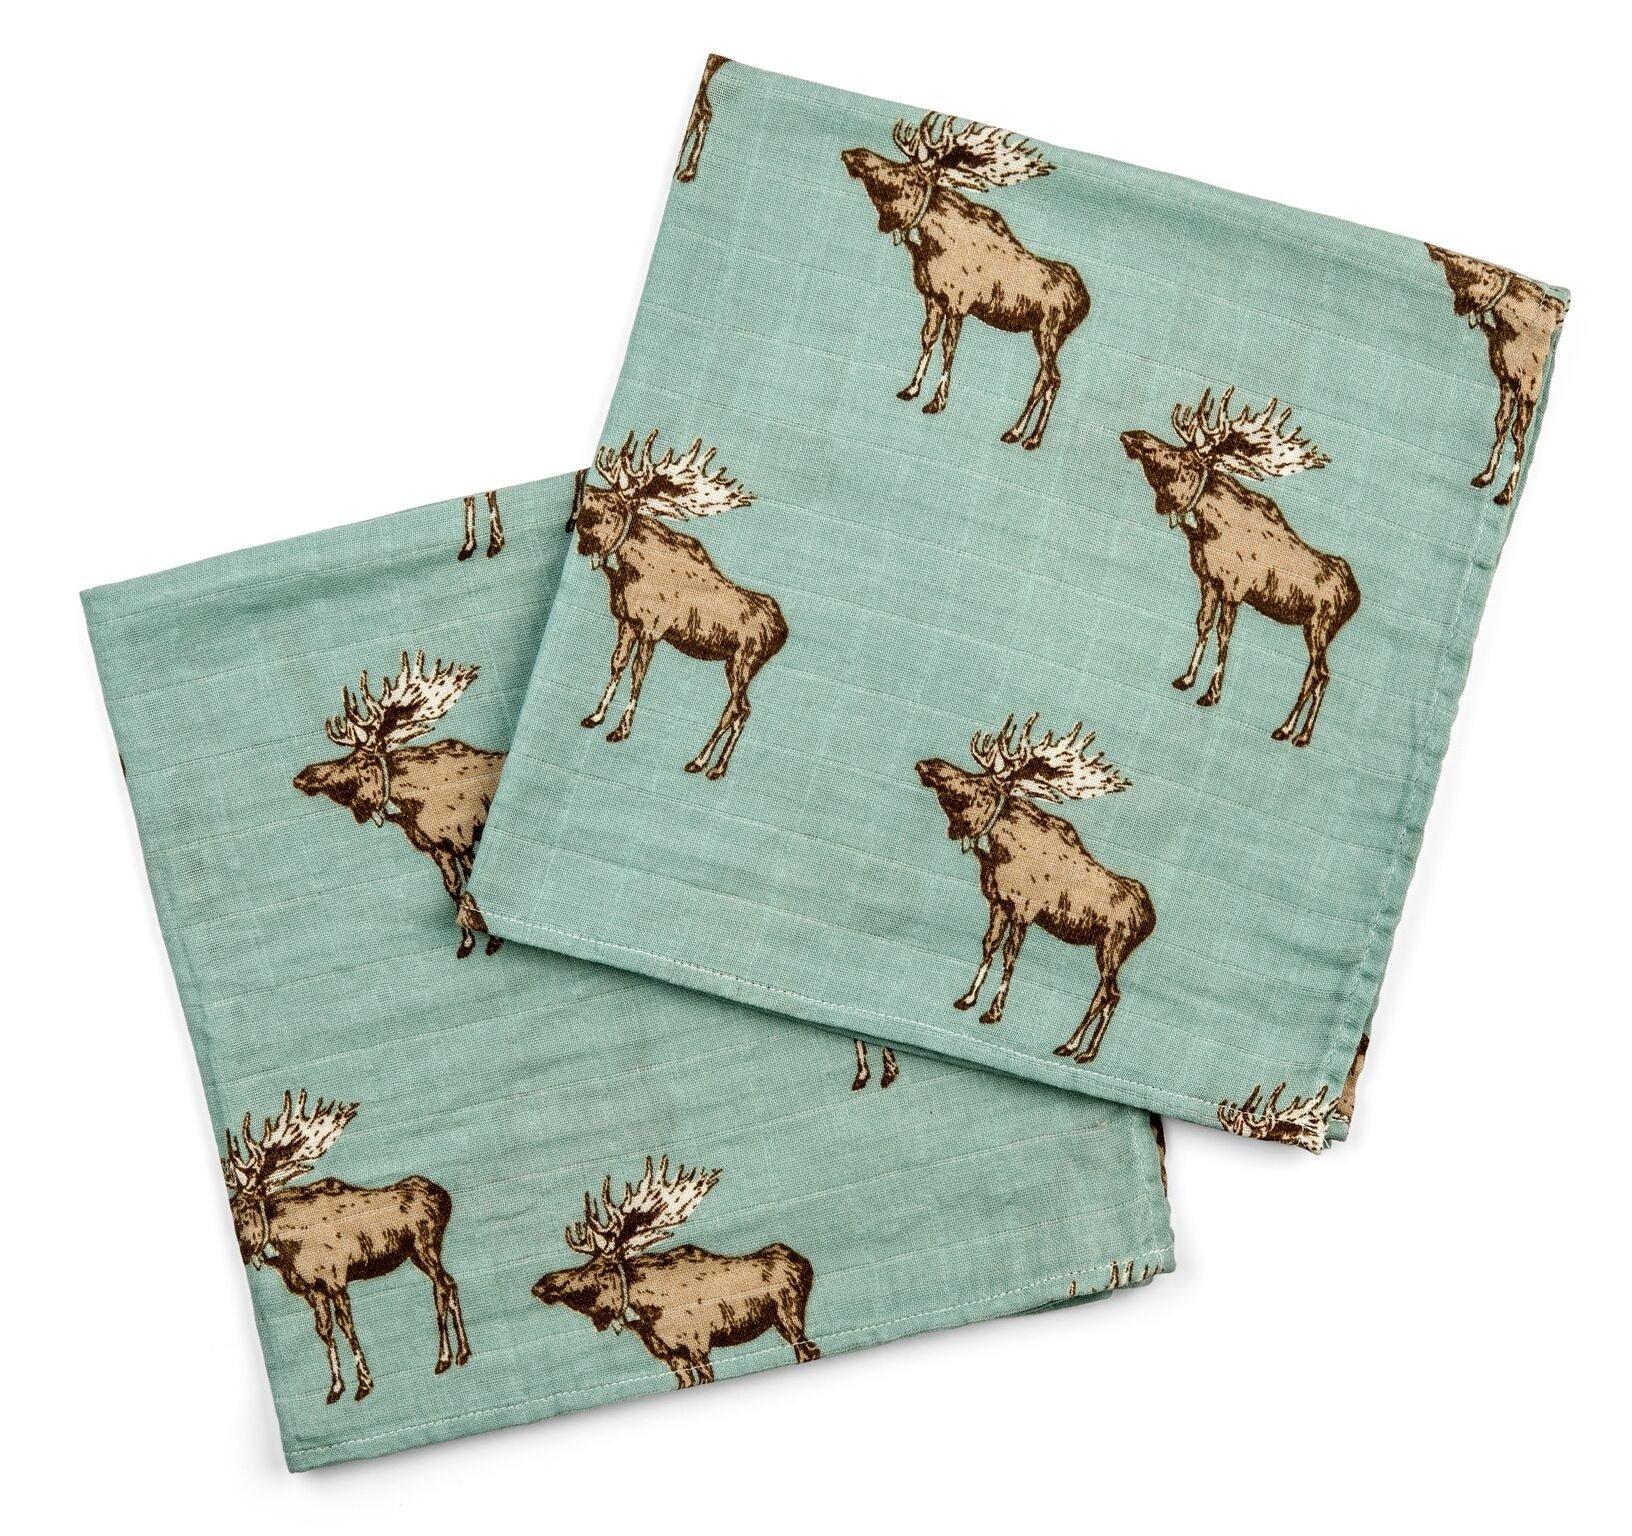 Milkbarn Bamboo Cotton Burp Cloths''Bow Tie Moose'' - Pack of 2